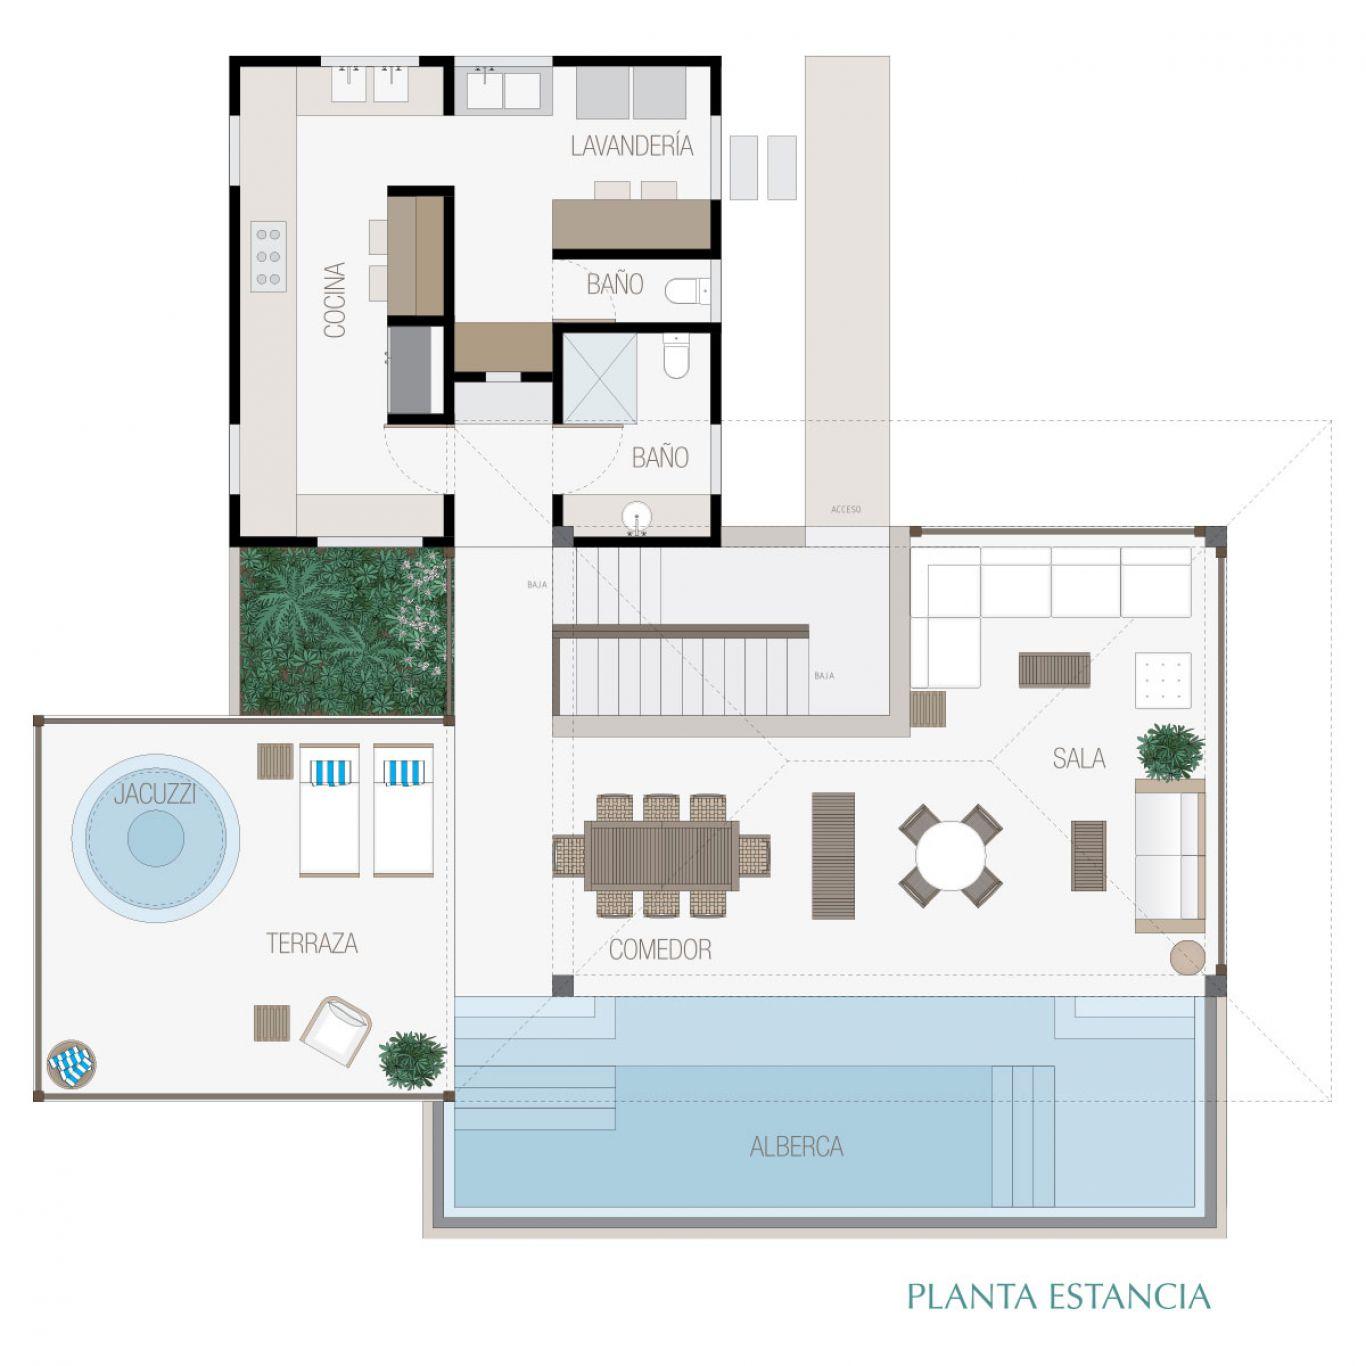 Manai, id 1519068, no 4, plano de villa 6, 292